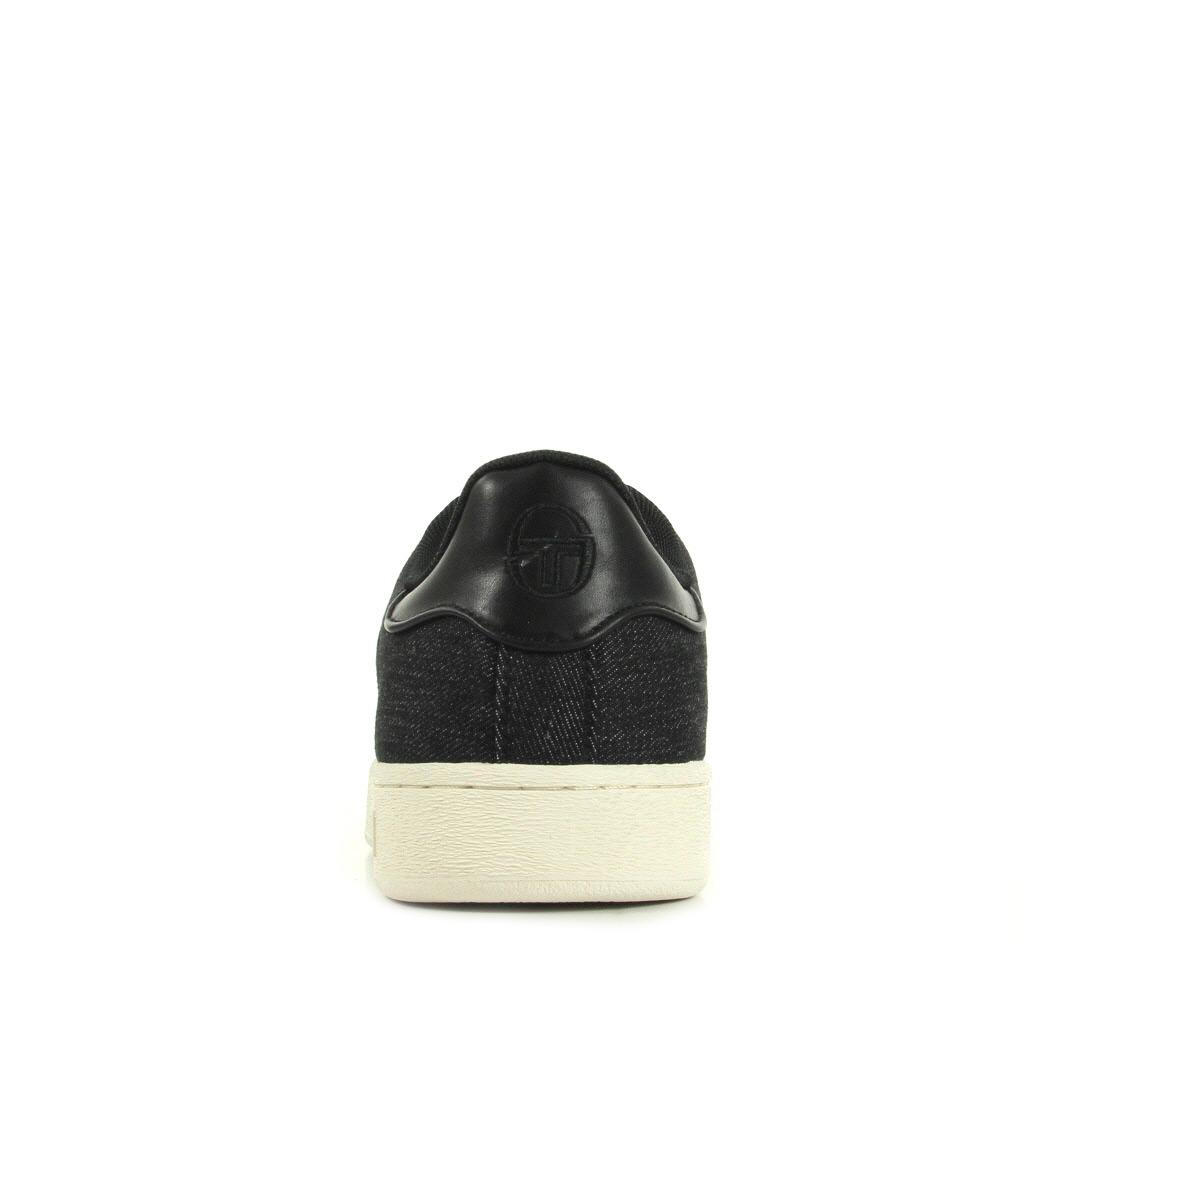 Sergio Tacchini Gran Torino Denim Deluxe ST61801020, Baskets mode homme